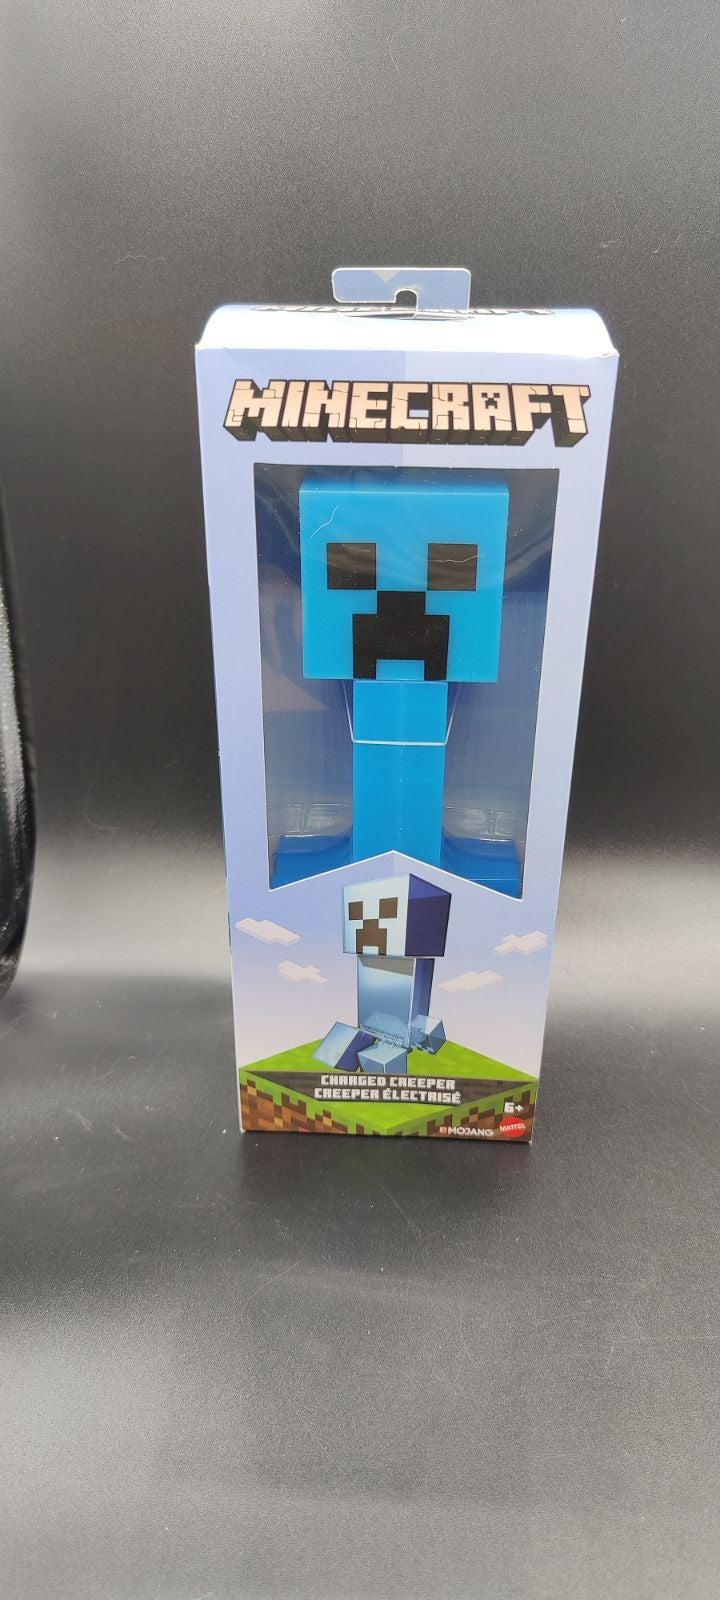 Neuf environ 21.59 cm Minecraft Creeper Figure 8.5 in